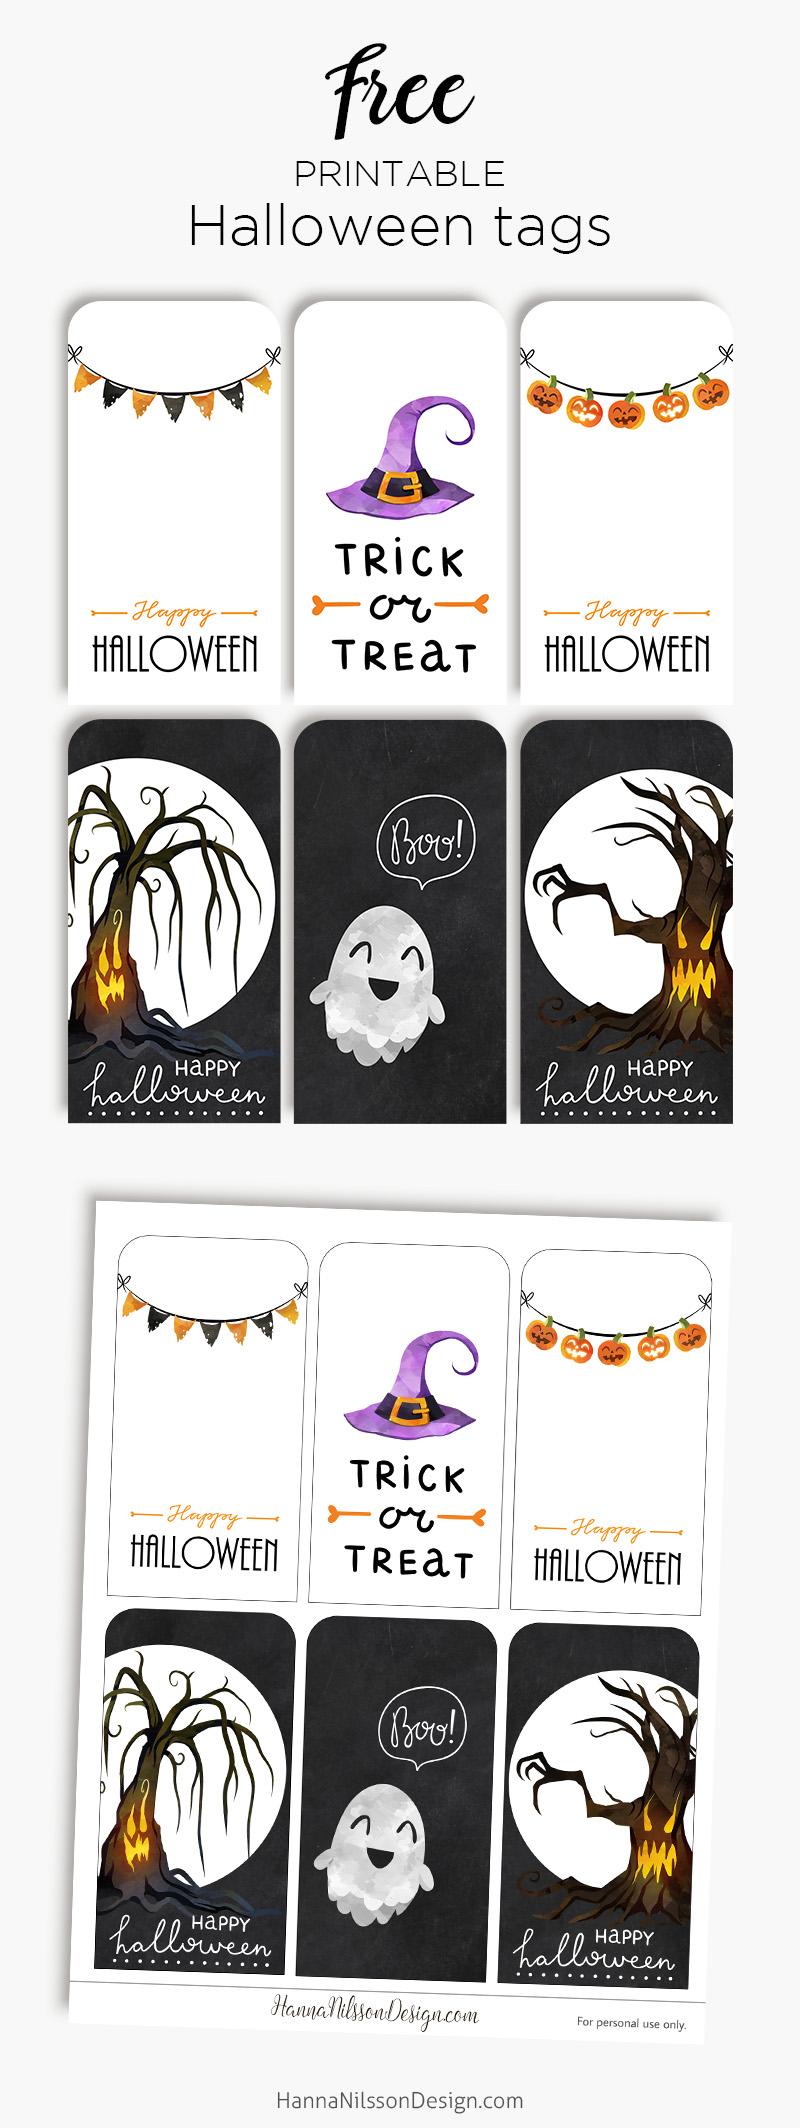 photograph regarding Cute Gift Tags Printable named Delighted Halloween tags Totally free printable creepy adorable